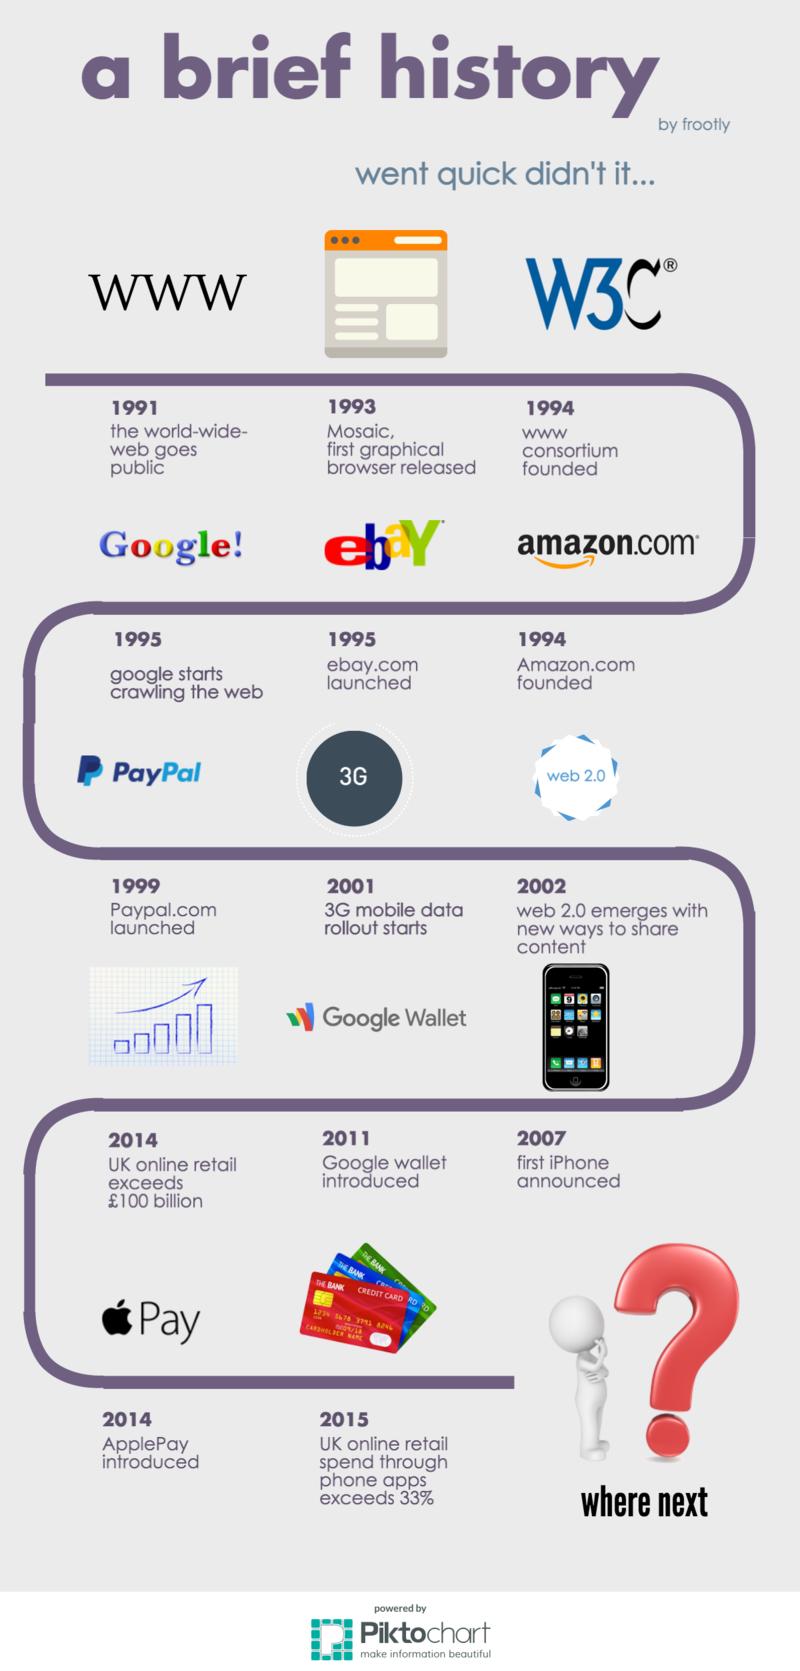 image showing timeline of the evolution of ecommerce